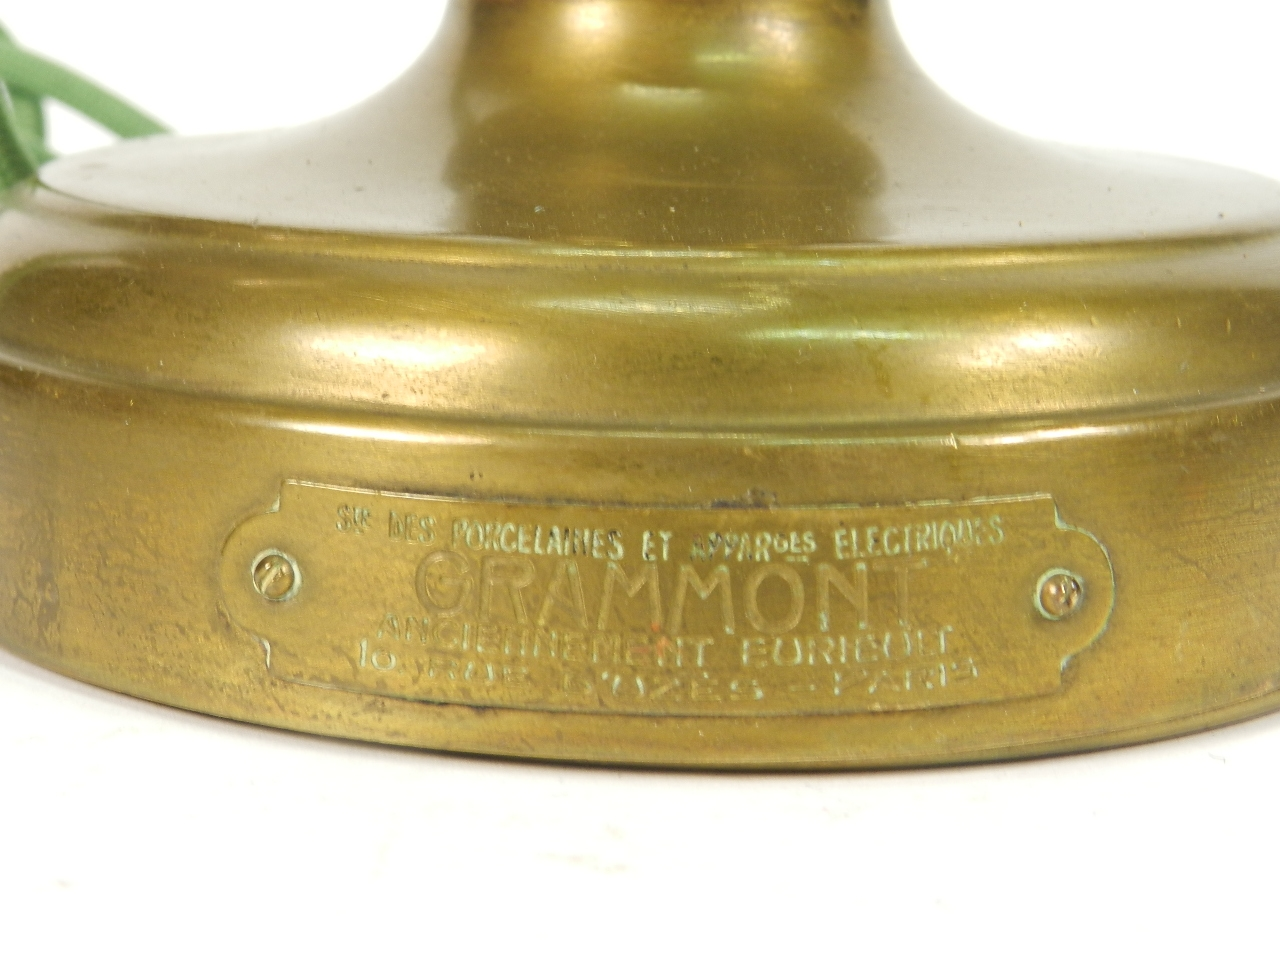 Imagen TELEFONO LATON GRAMMONT AÑO 1920 41237